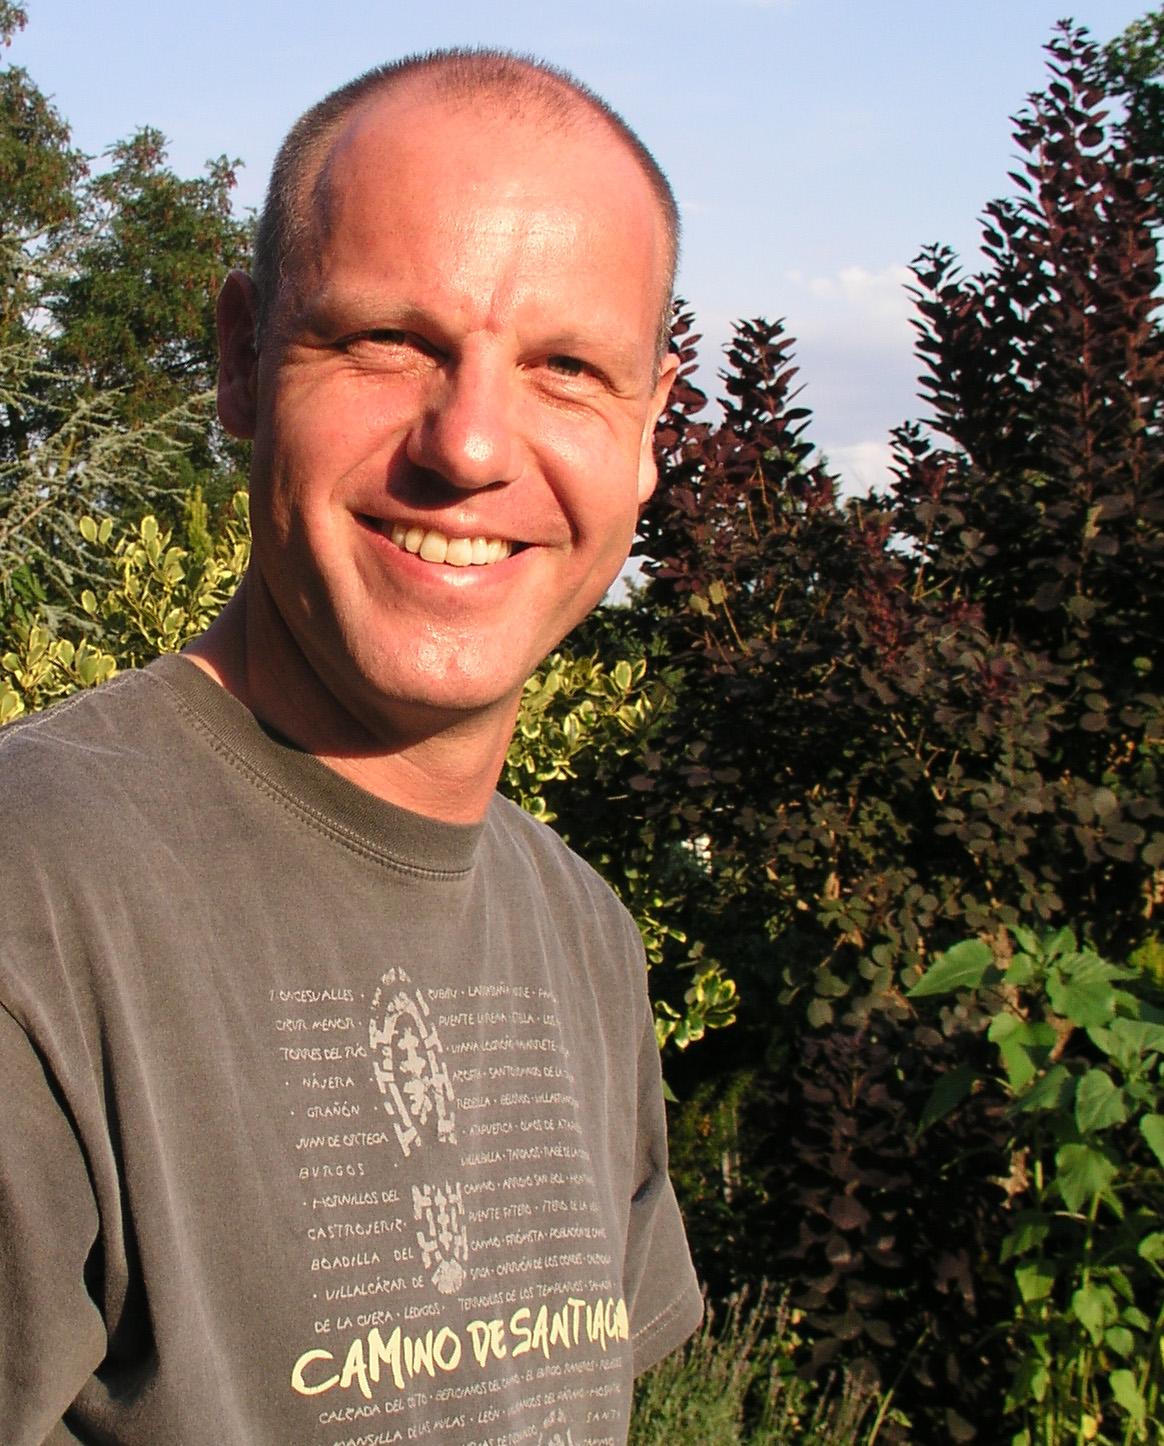 Markus Diekow